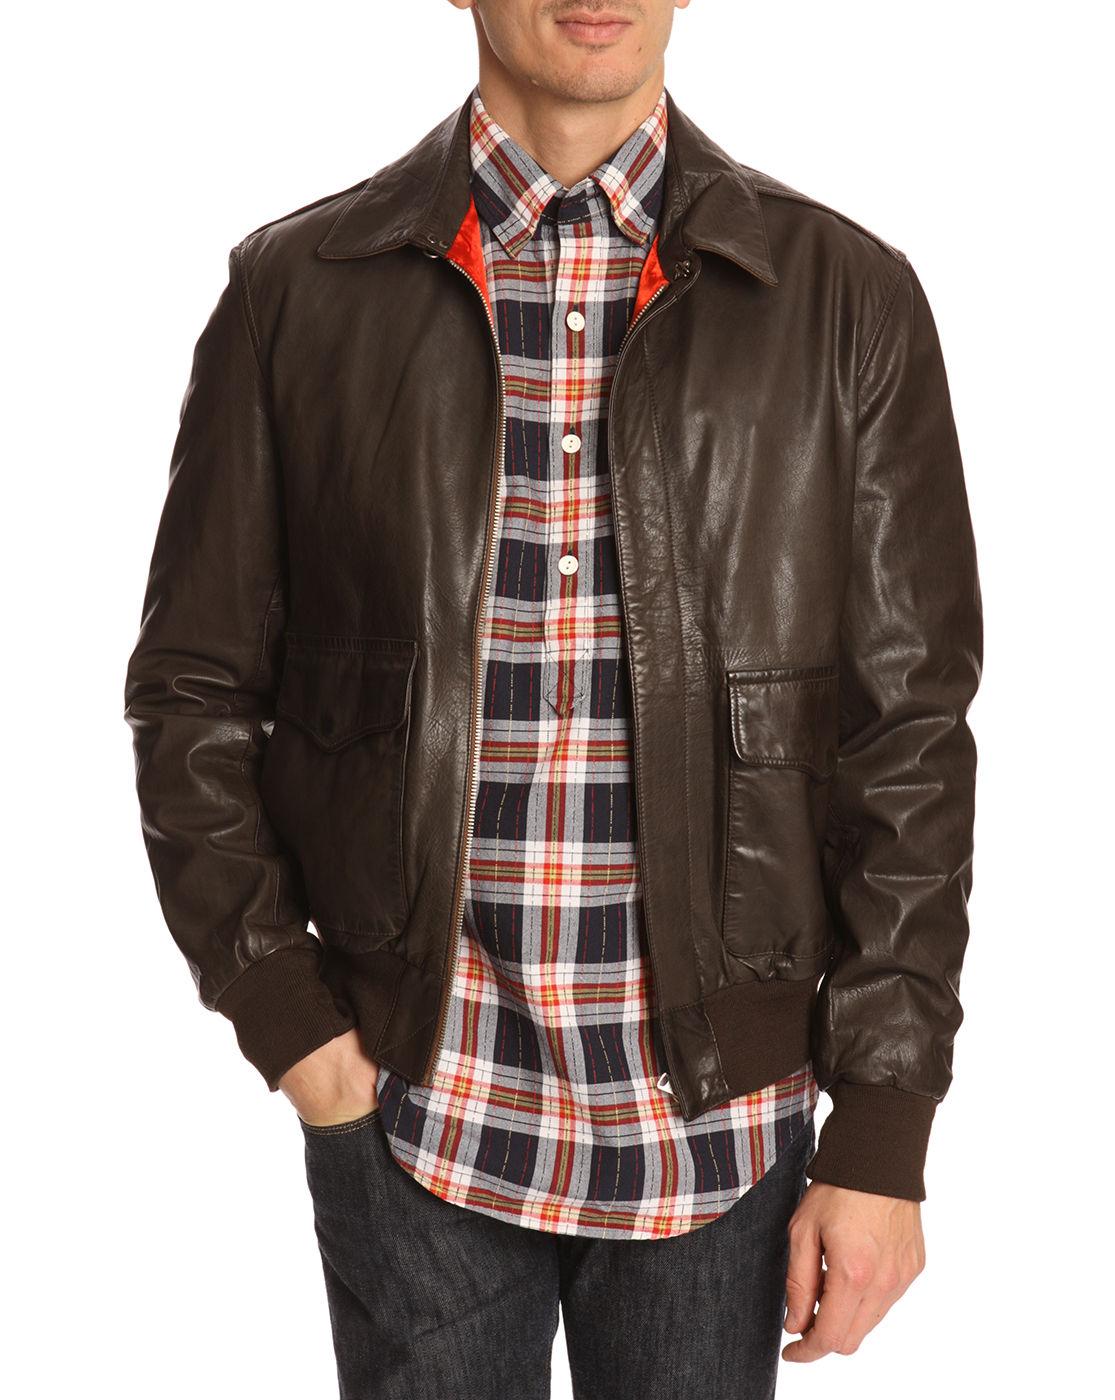 Brown Leather Flight Jacket